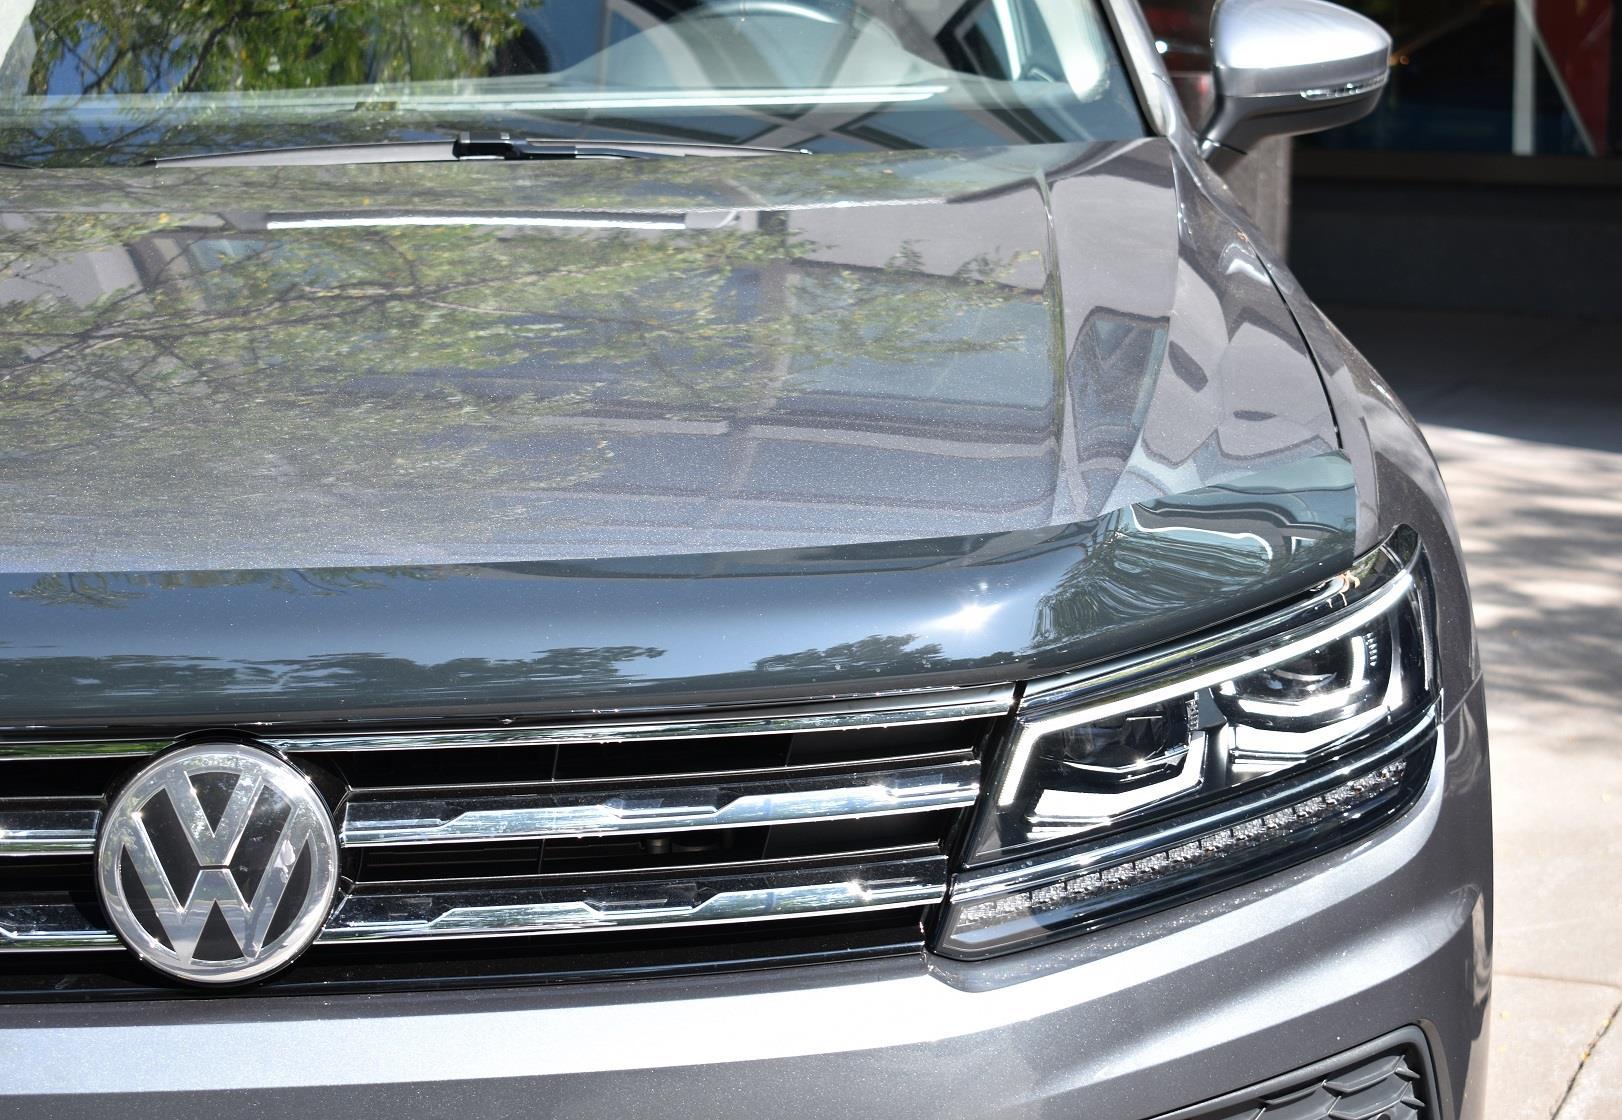 volkswagen tiguan hood deflector hood deflector bug insect plastic protection